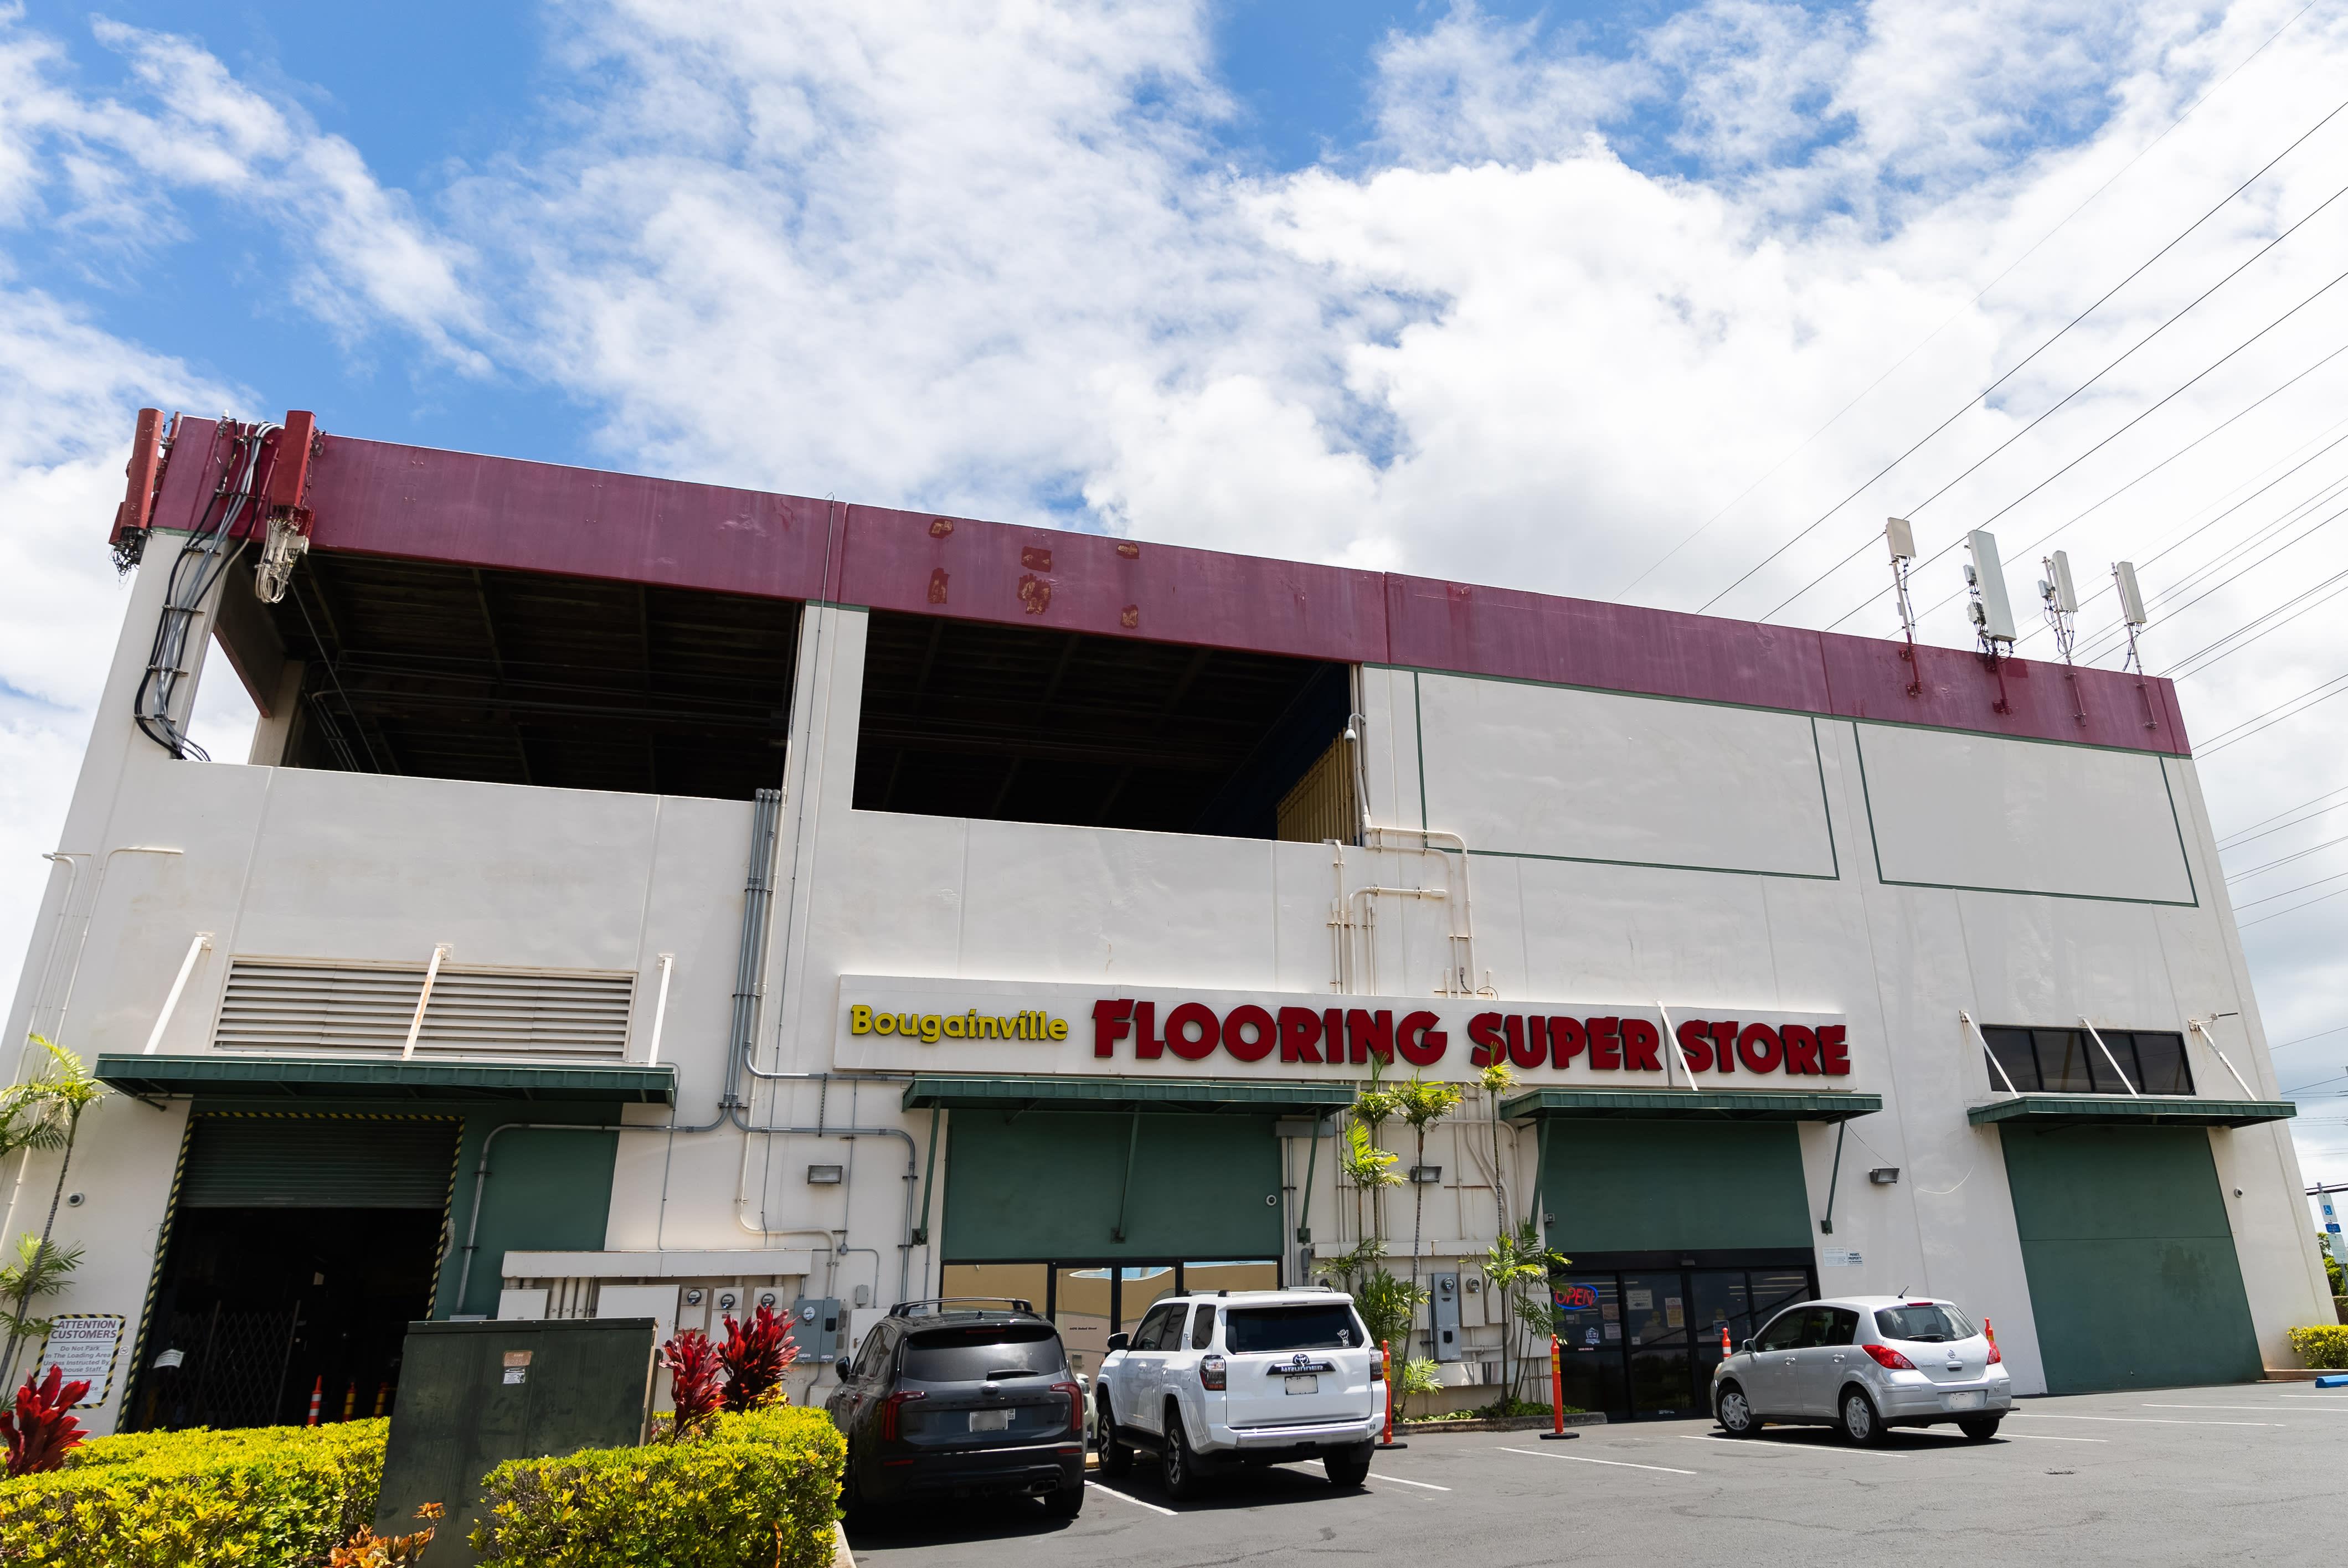 Bougainville Flooring Super Store showroom near Honolulu, HI